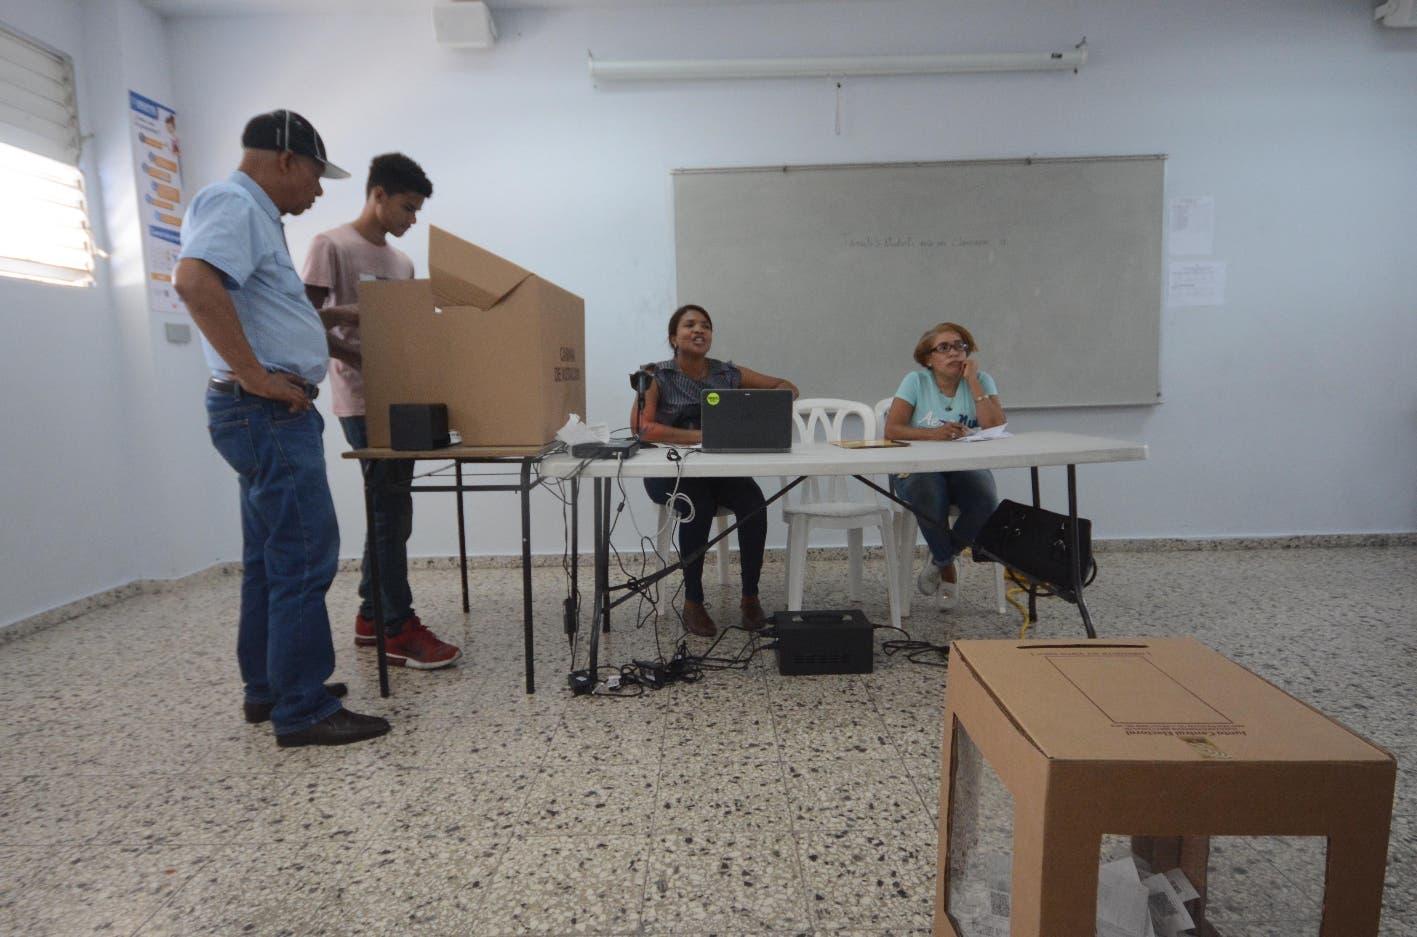 PRM solicita a JCE informe a electores cuyos lugares de votación fueron cambiados